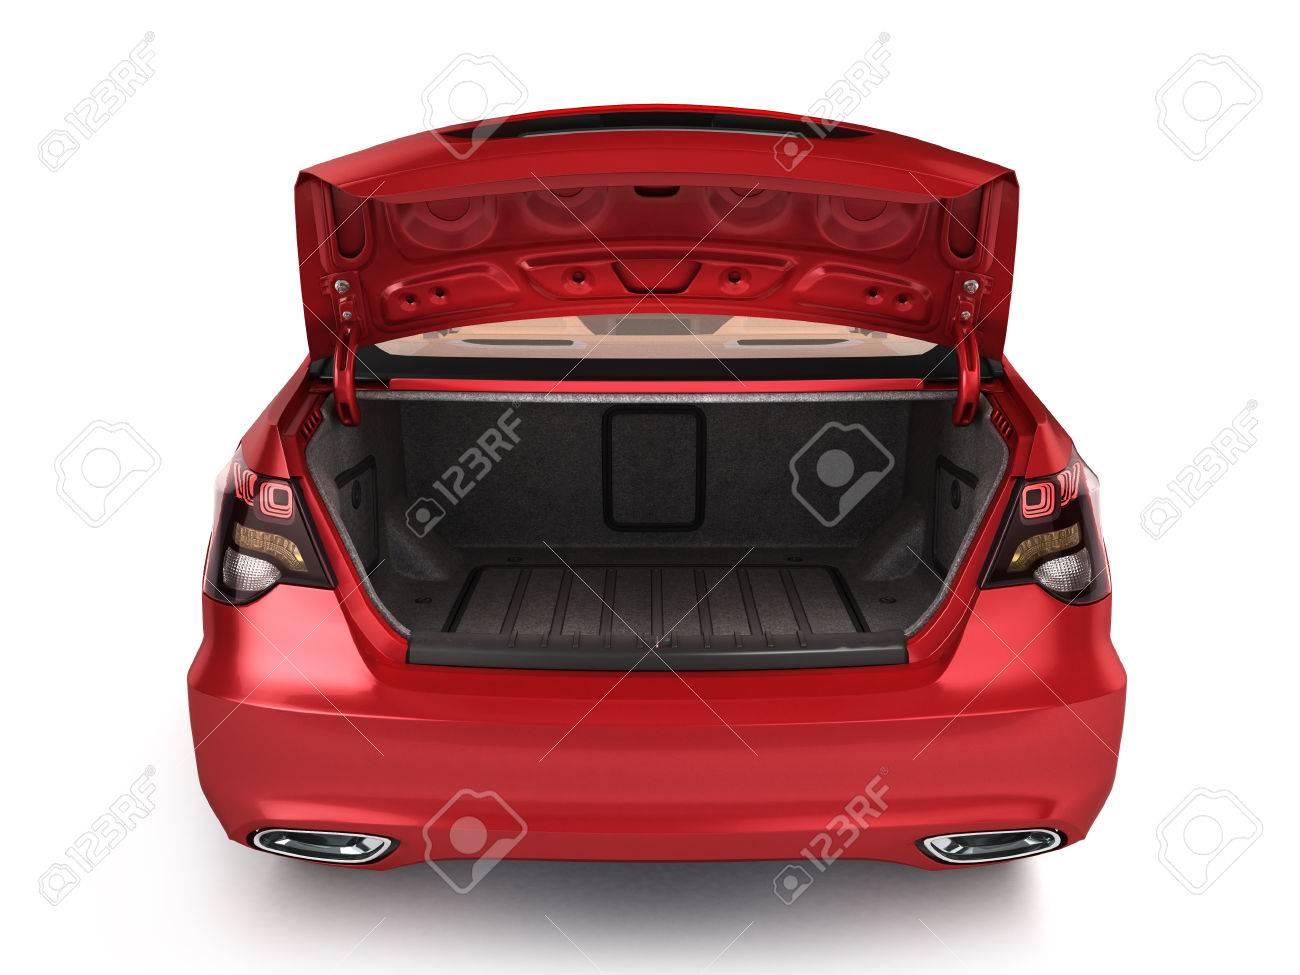 empty open trunk of a car 3d render - 65580785